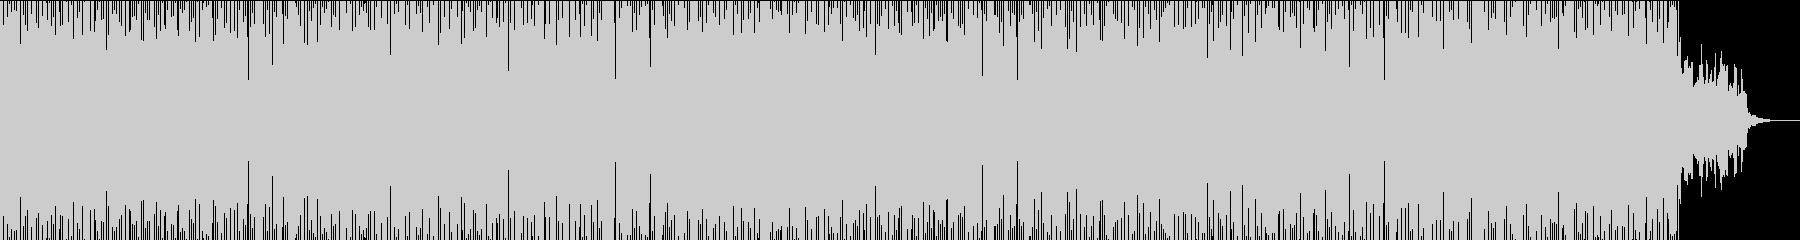 EDMクラブ系、製品紹介、商品紹介-02の未再生の波形